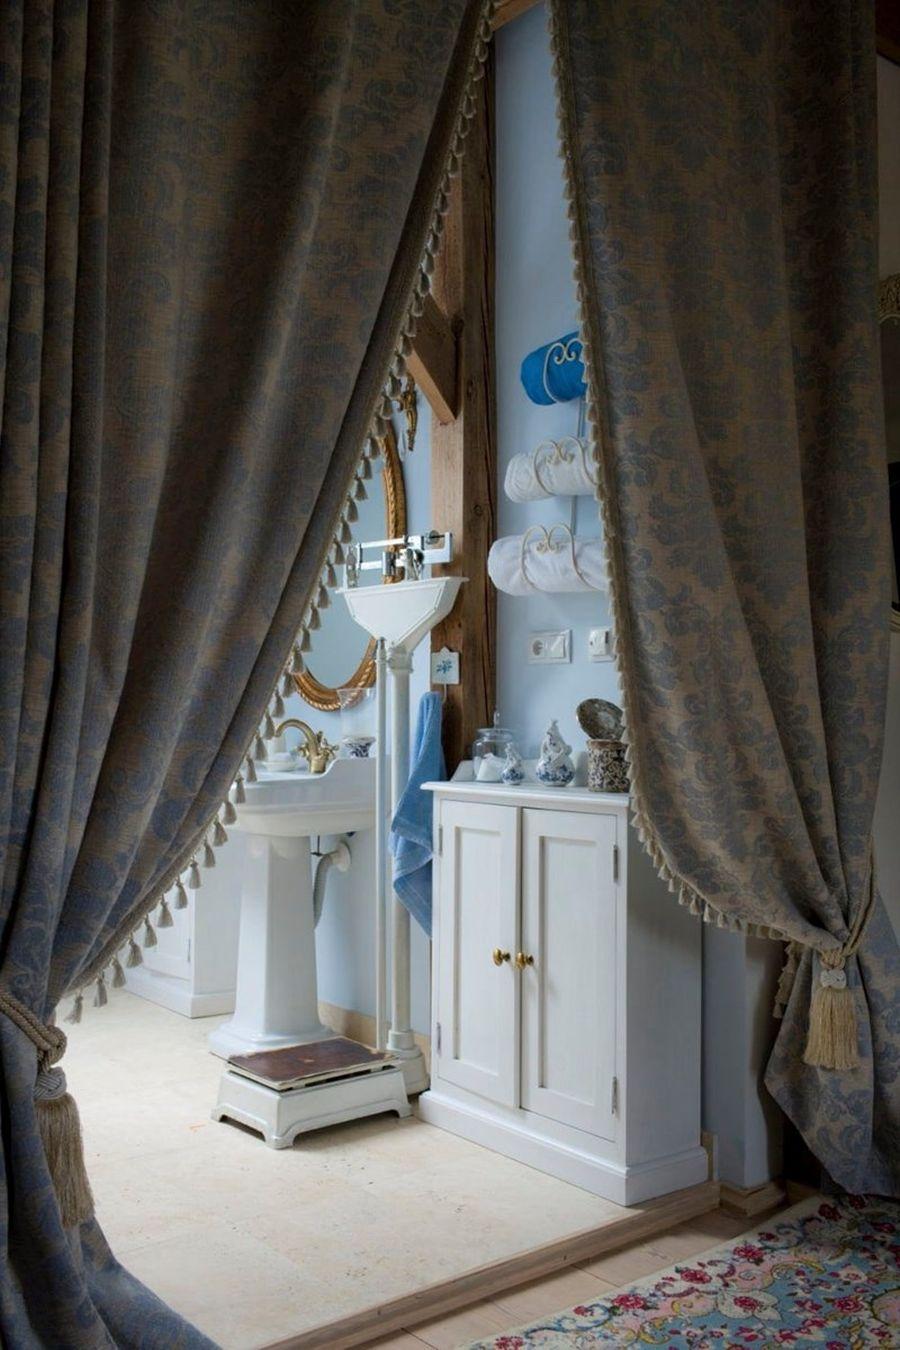 adelaparvu.com despre mansarda romantica, stil rustic, Design PrzepisnaDom, Foto Rafal Lipski (12)